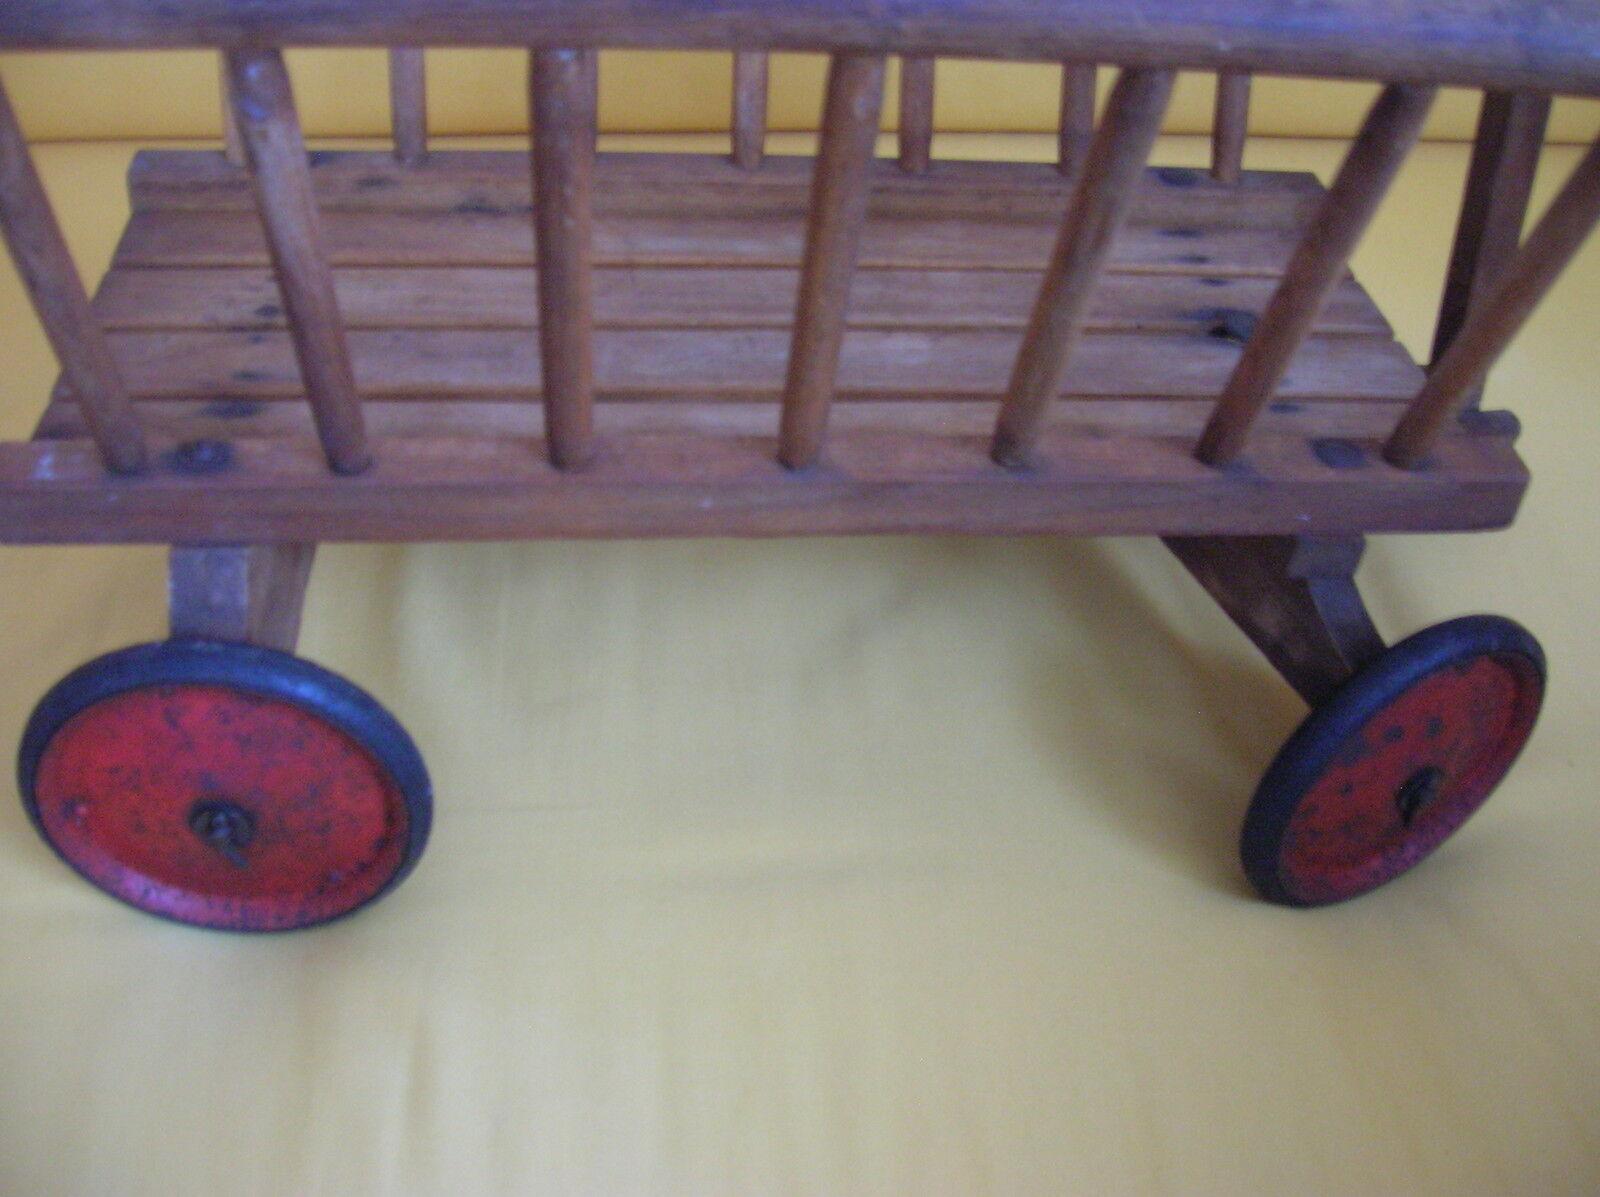 Bollerwagen Handwagen Rollwagen Transportkarre Transportkarre Transportkarre B 48 T56 H 86 cm Vintage ca. 60er 0220b0